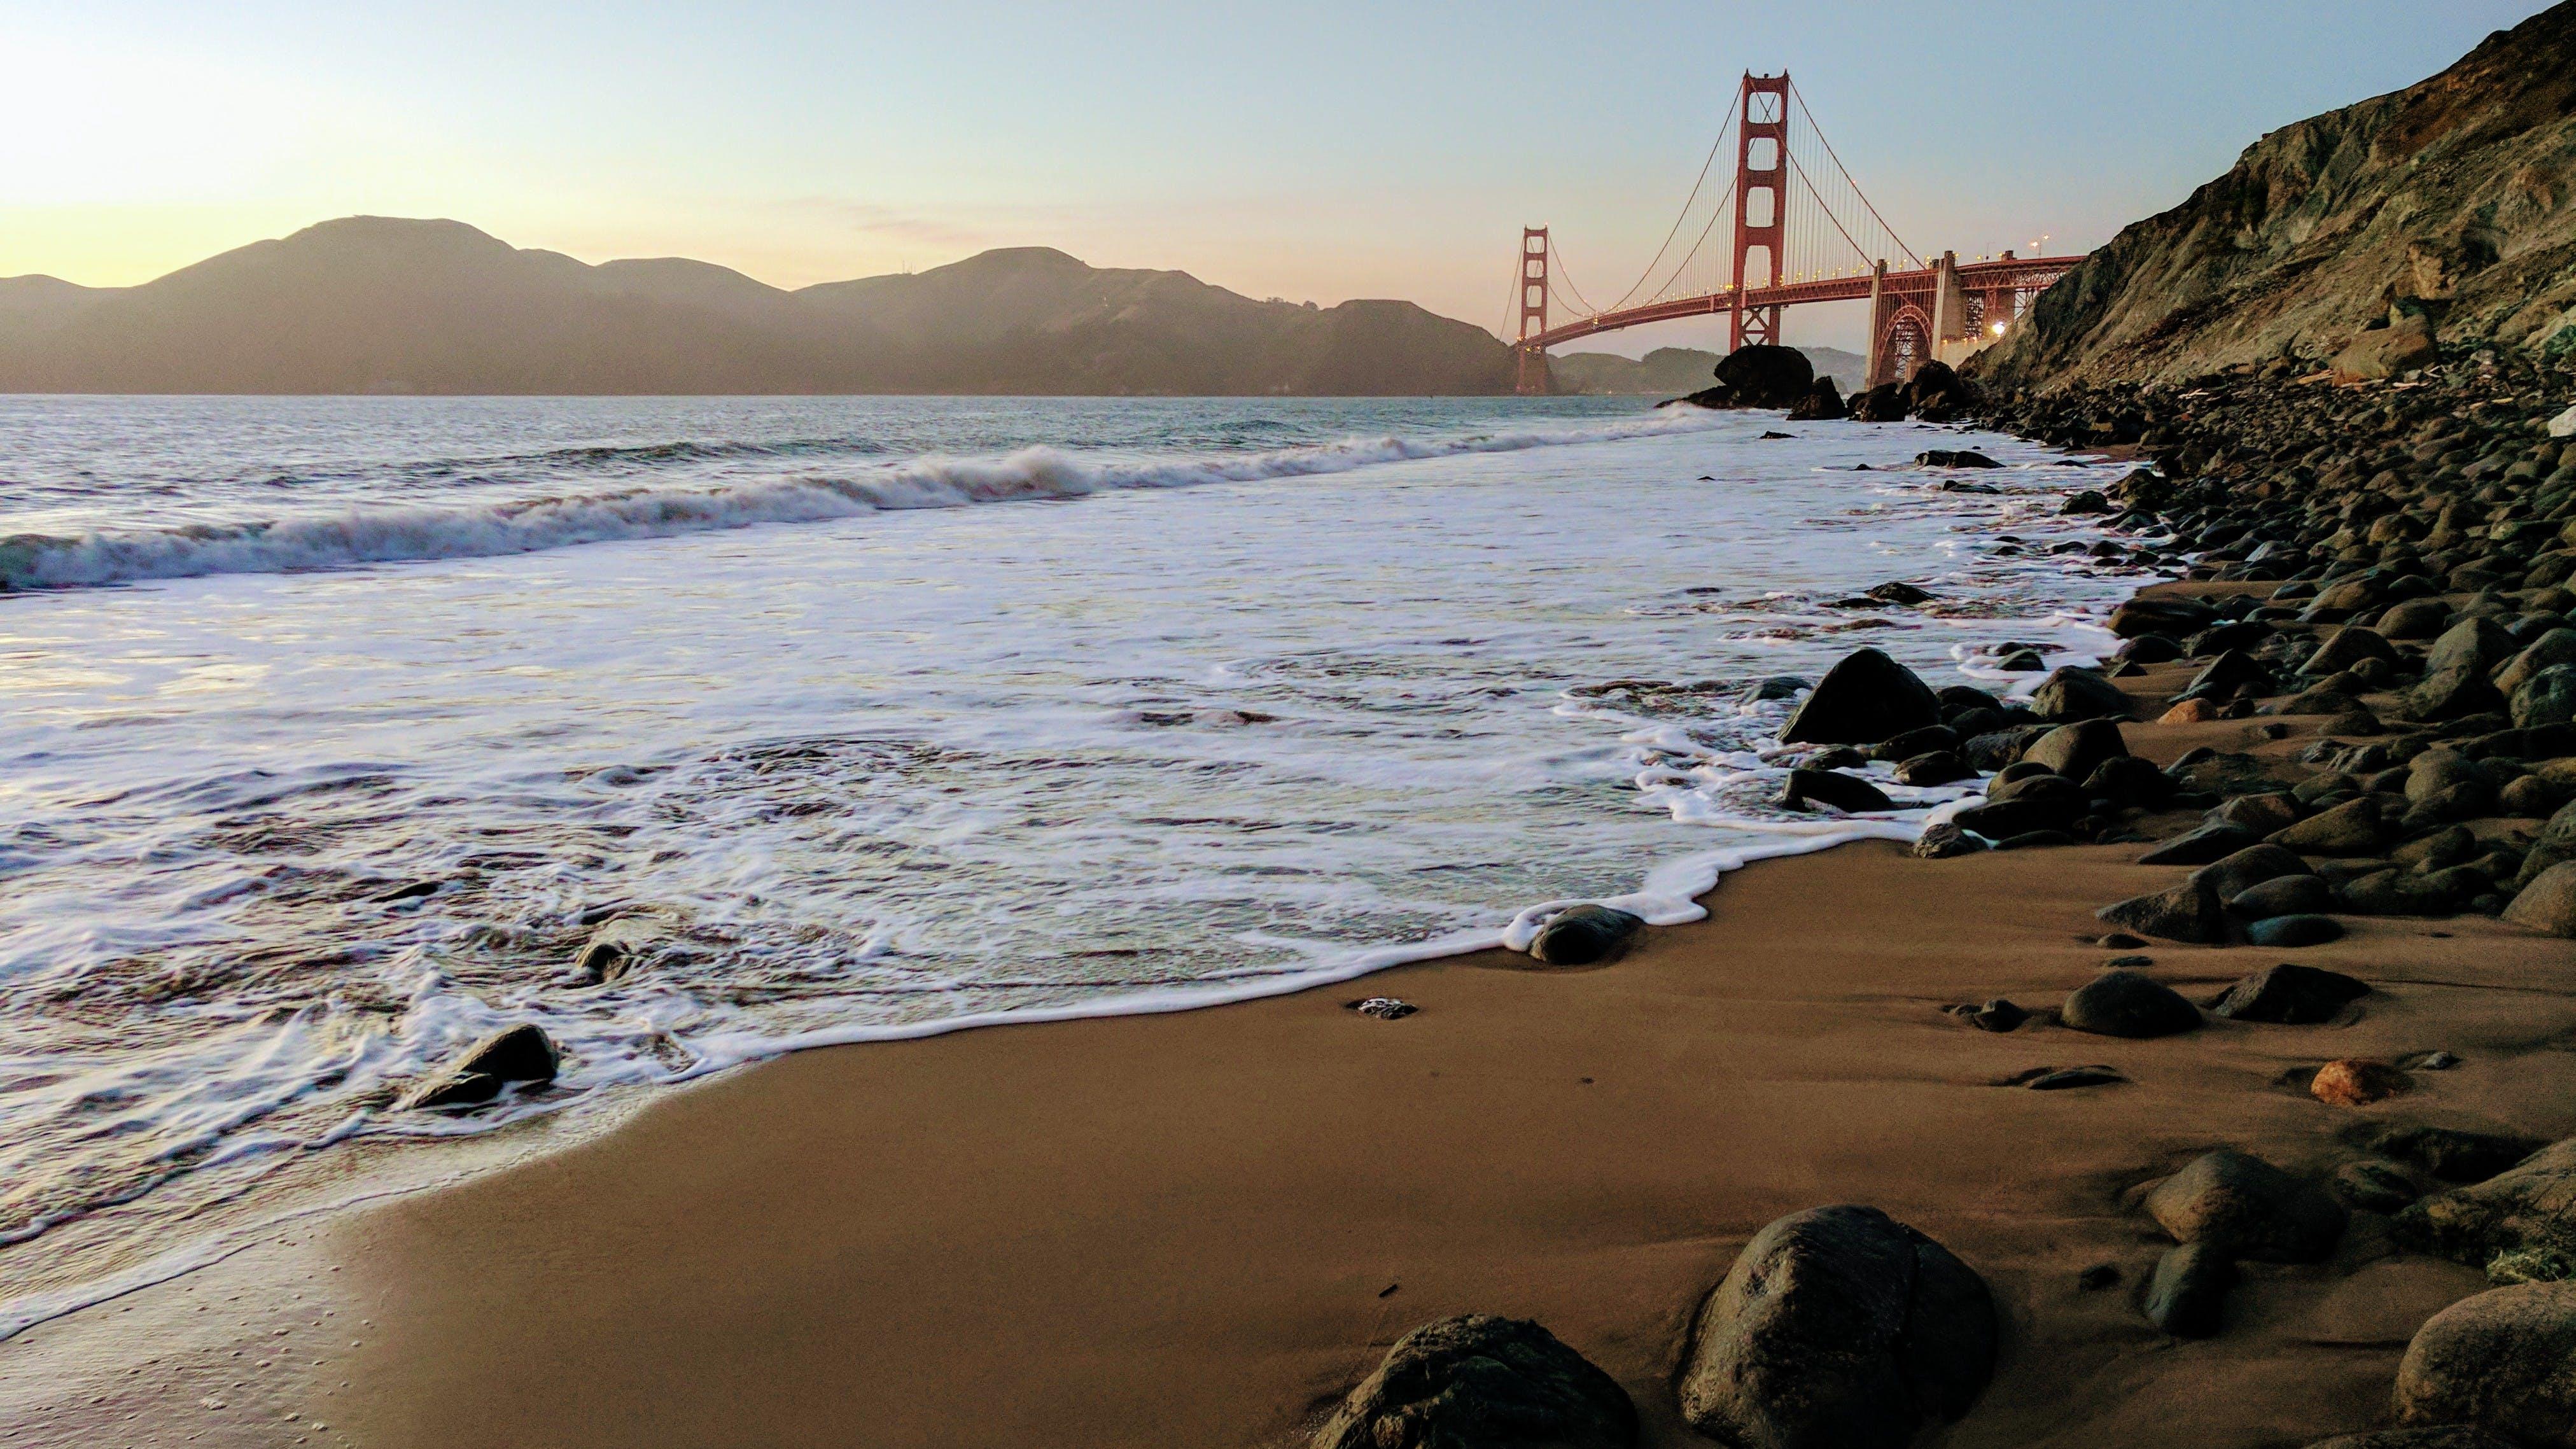 Red Steel Bridge over Calm Sea